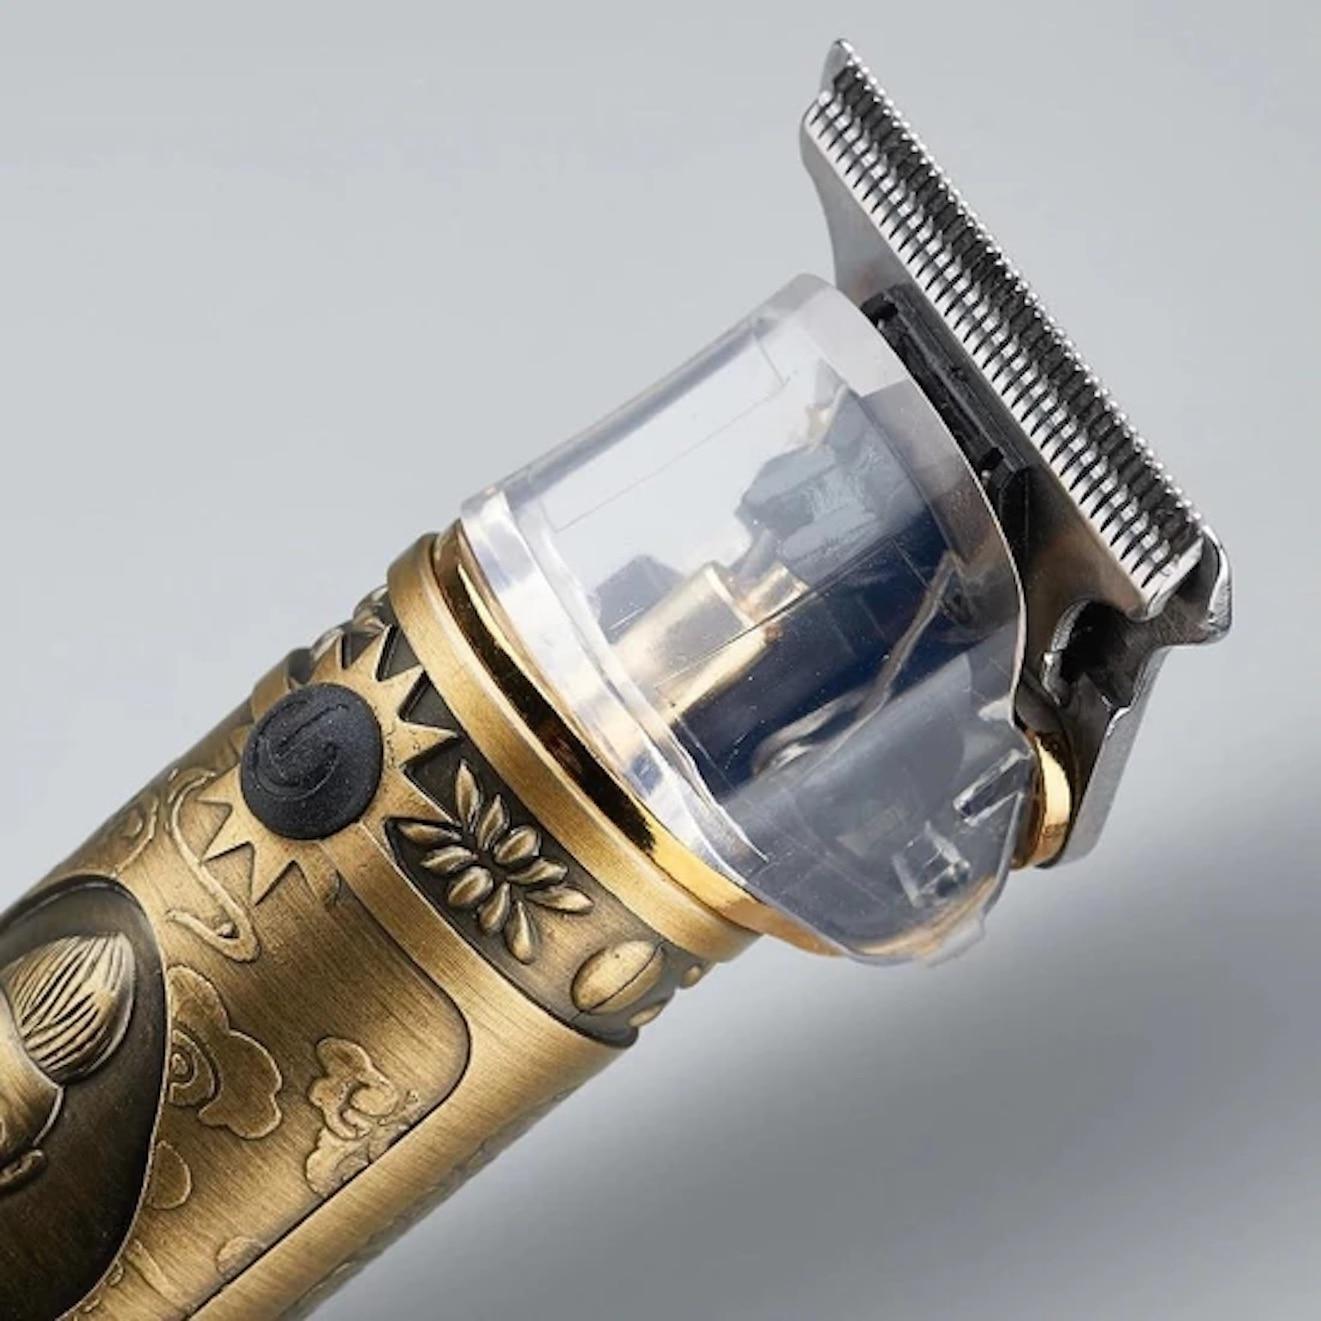 Powertec TR-1818 T-Blade Nape Beard Drawing Shaver Beard Shaping Hair Styling Shaver enlarge